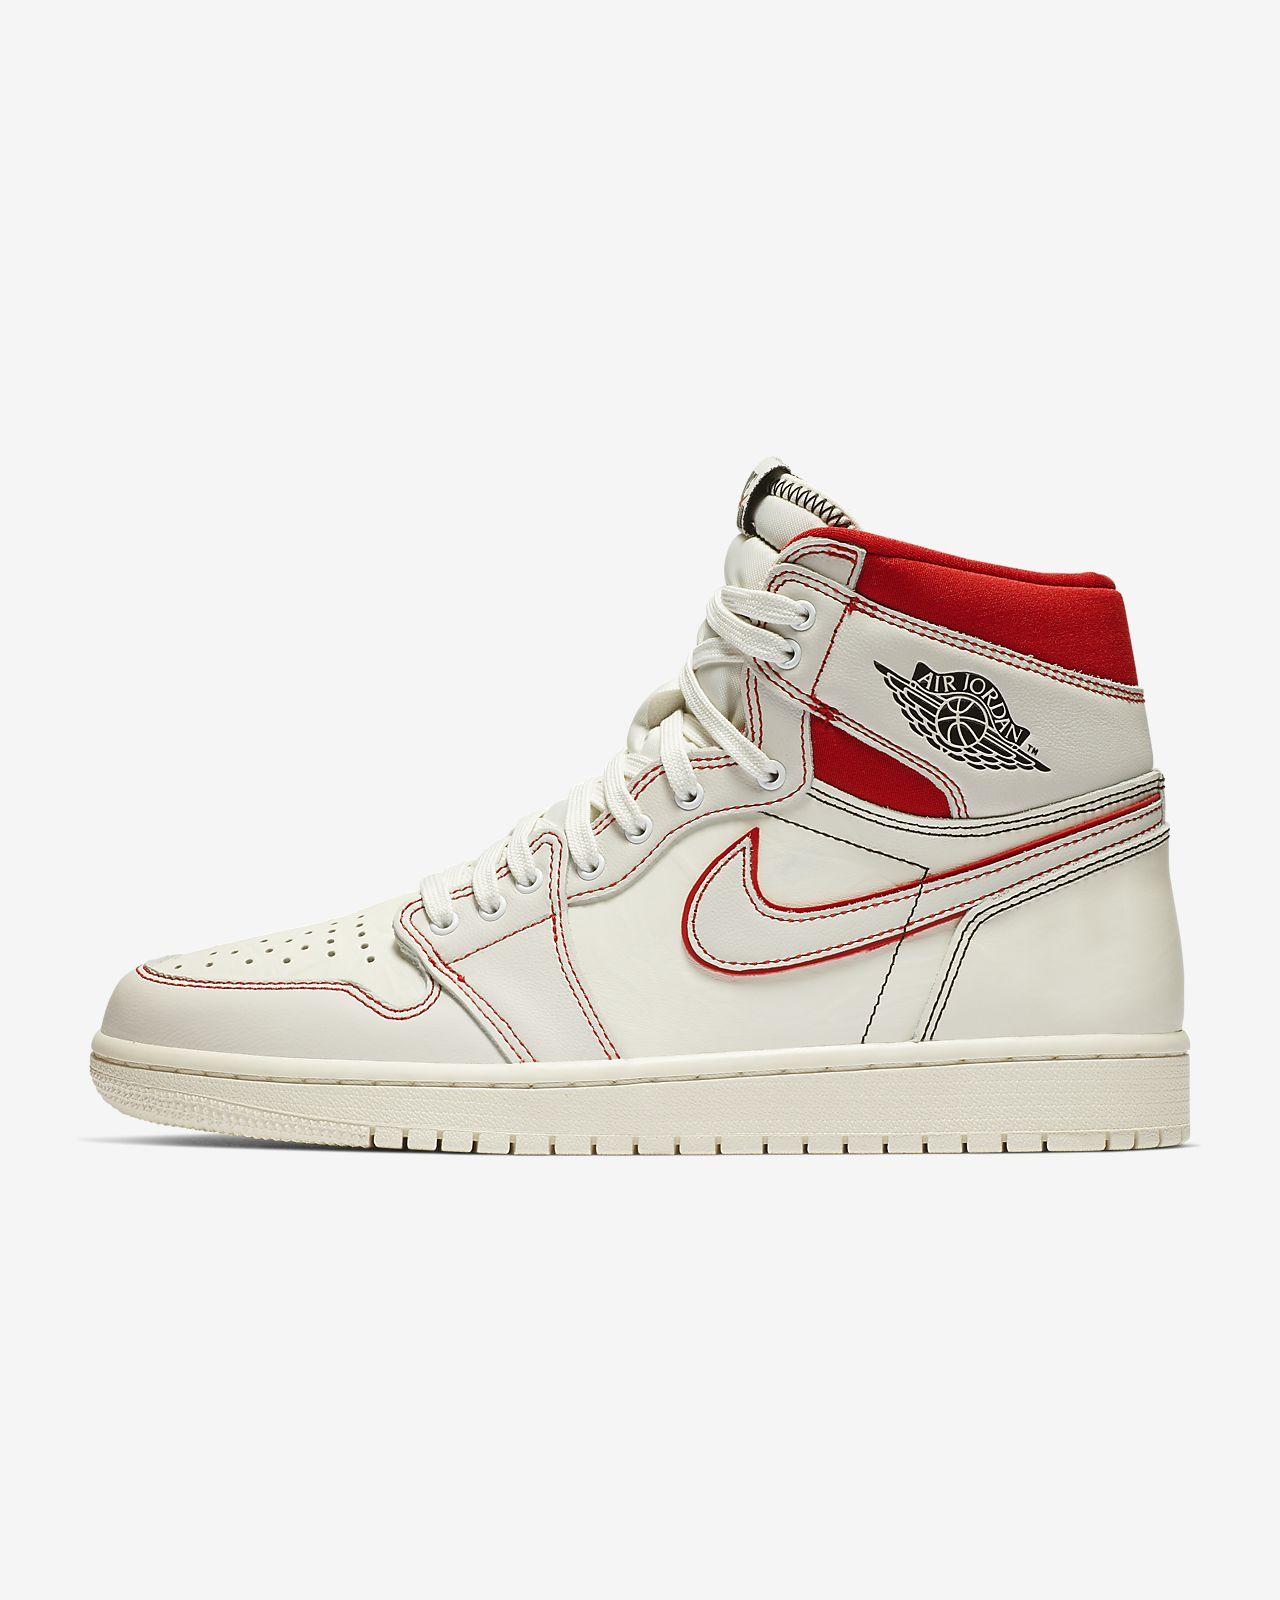 reputable site 50116 d4440 ... Air Jordan 1 Retro High OG Schuh